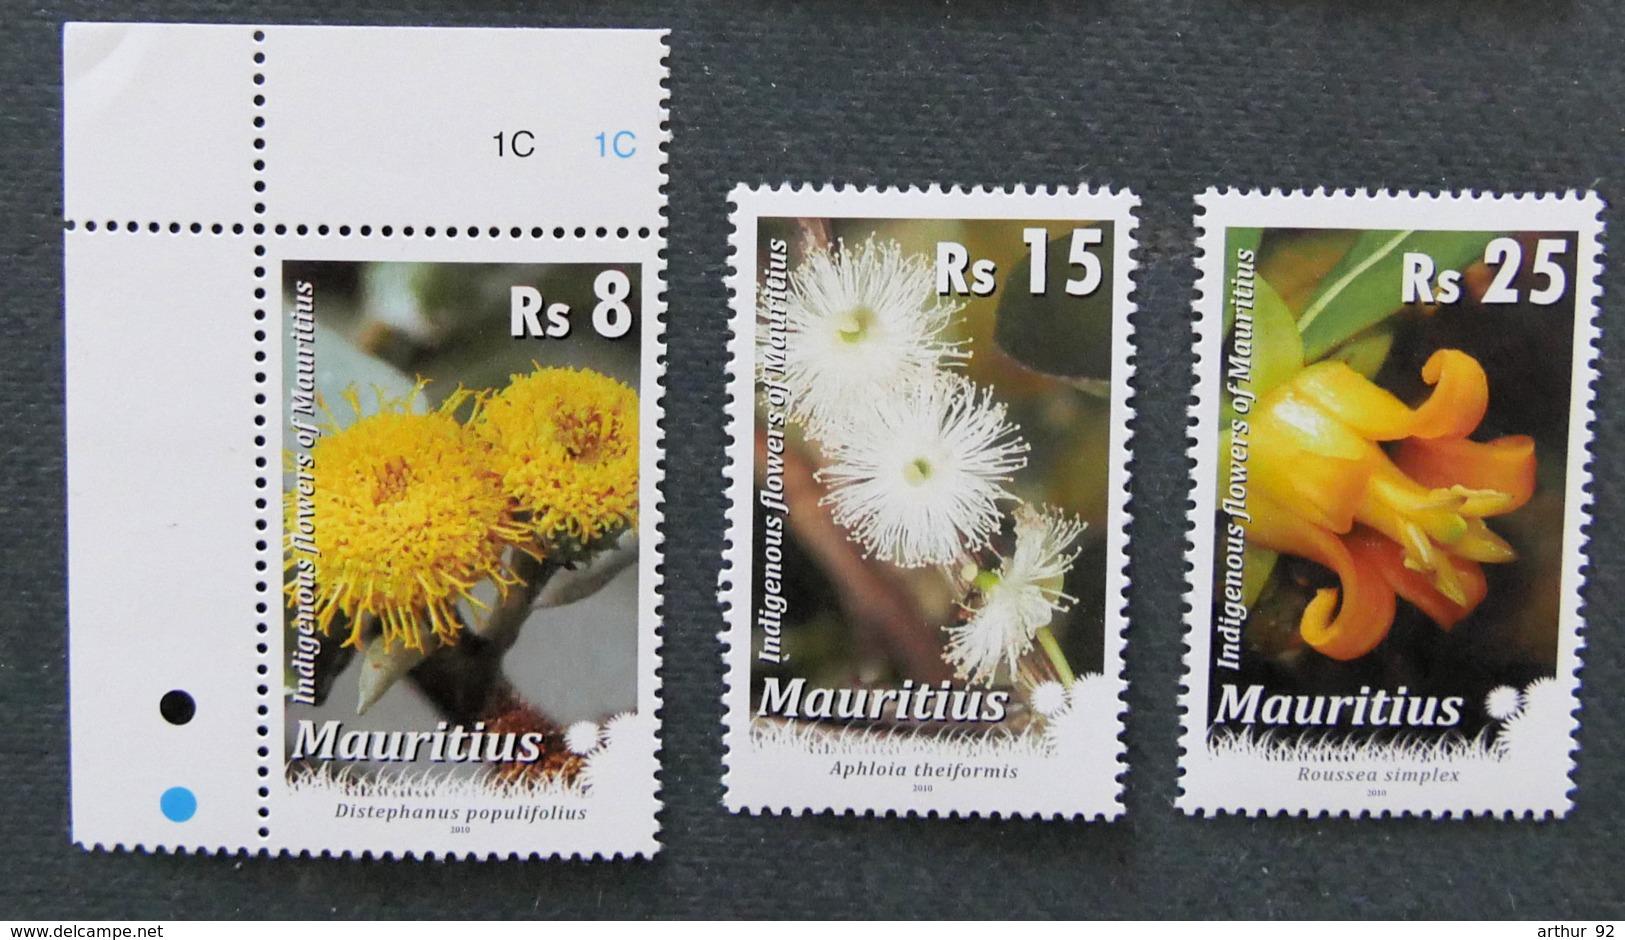 ILE MAURICE - MAURITIUS - 2010 - YT 1115 à 1117 ** - SERIE COURANTE - FLEURS - Mauritius (1968-...)